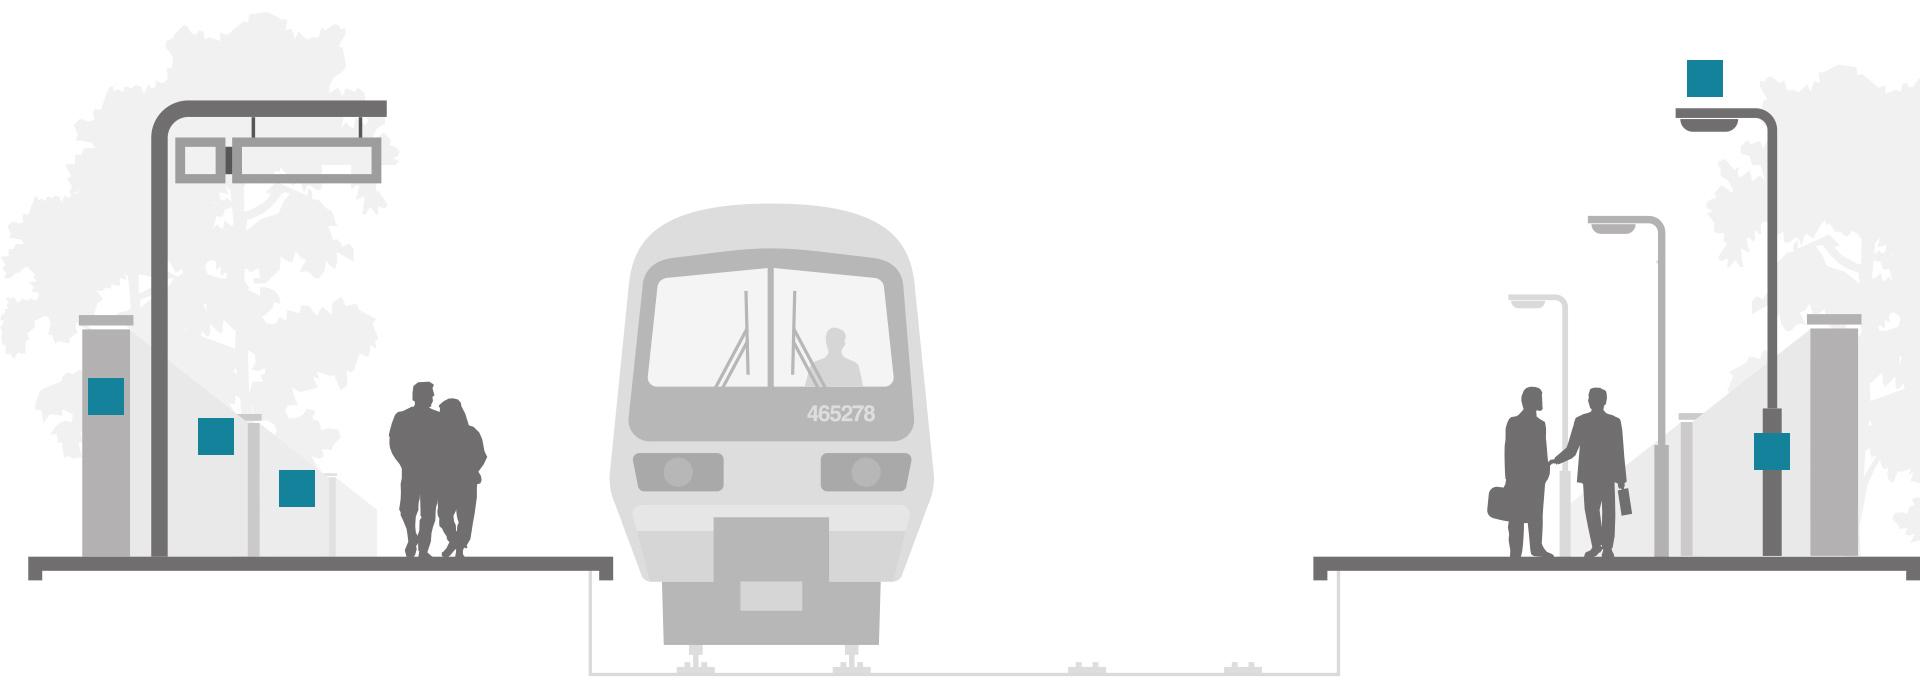 Transportapplications_open_platform